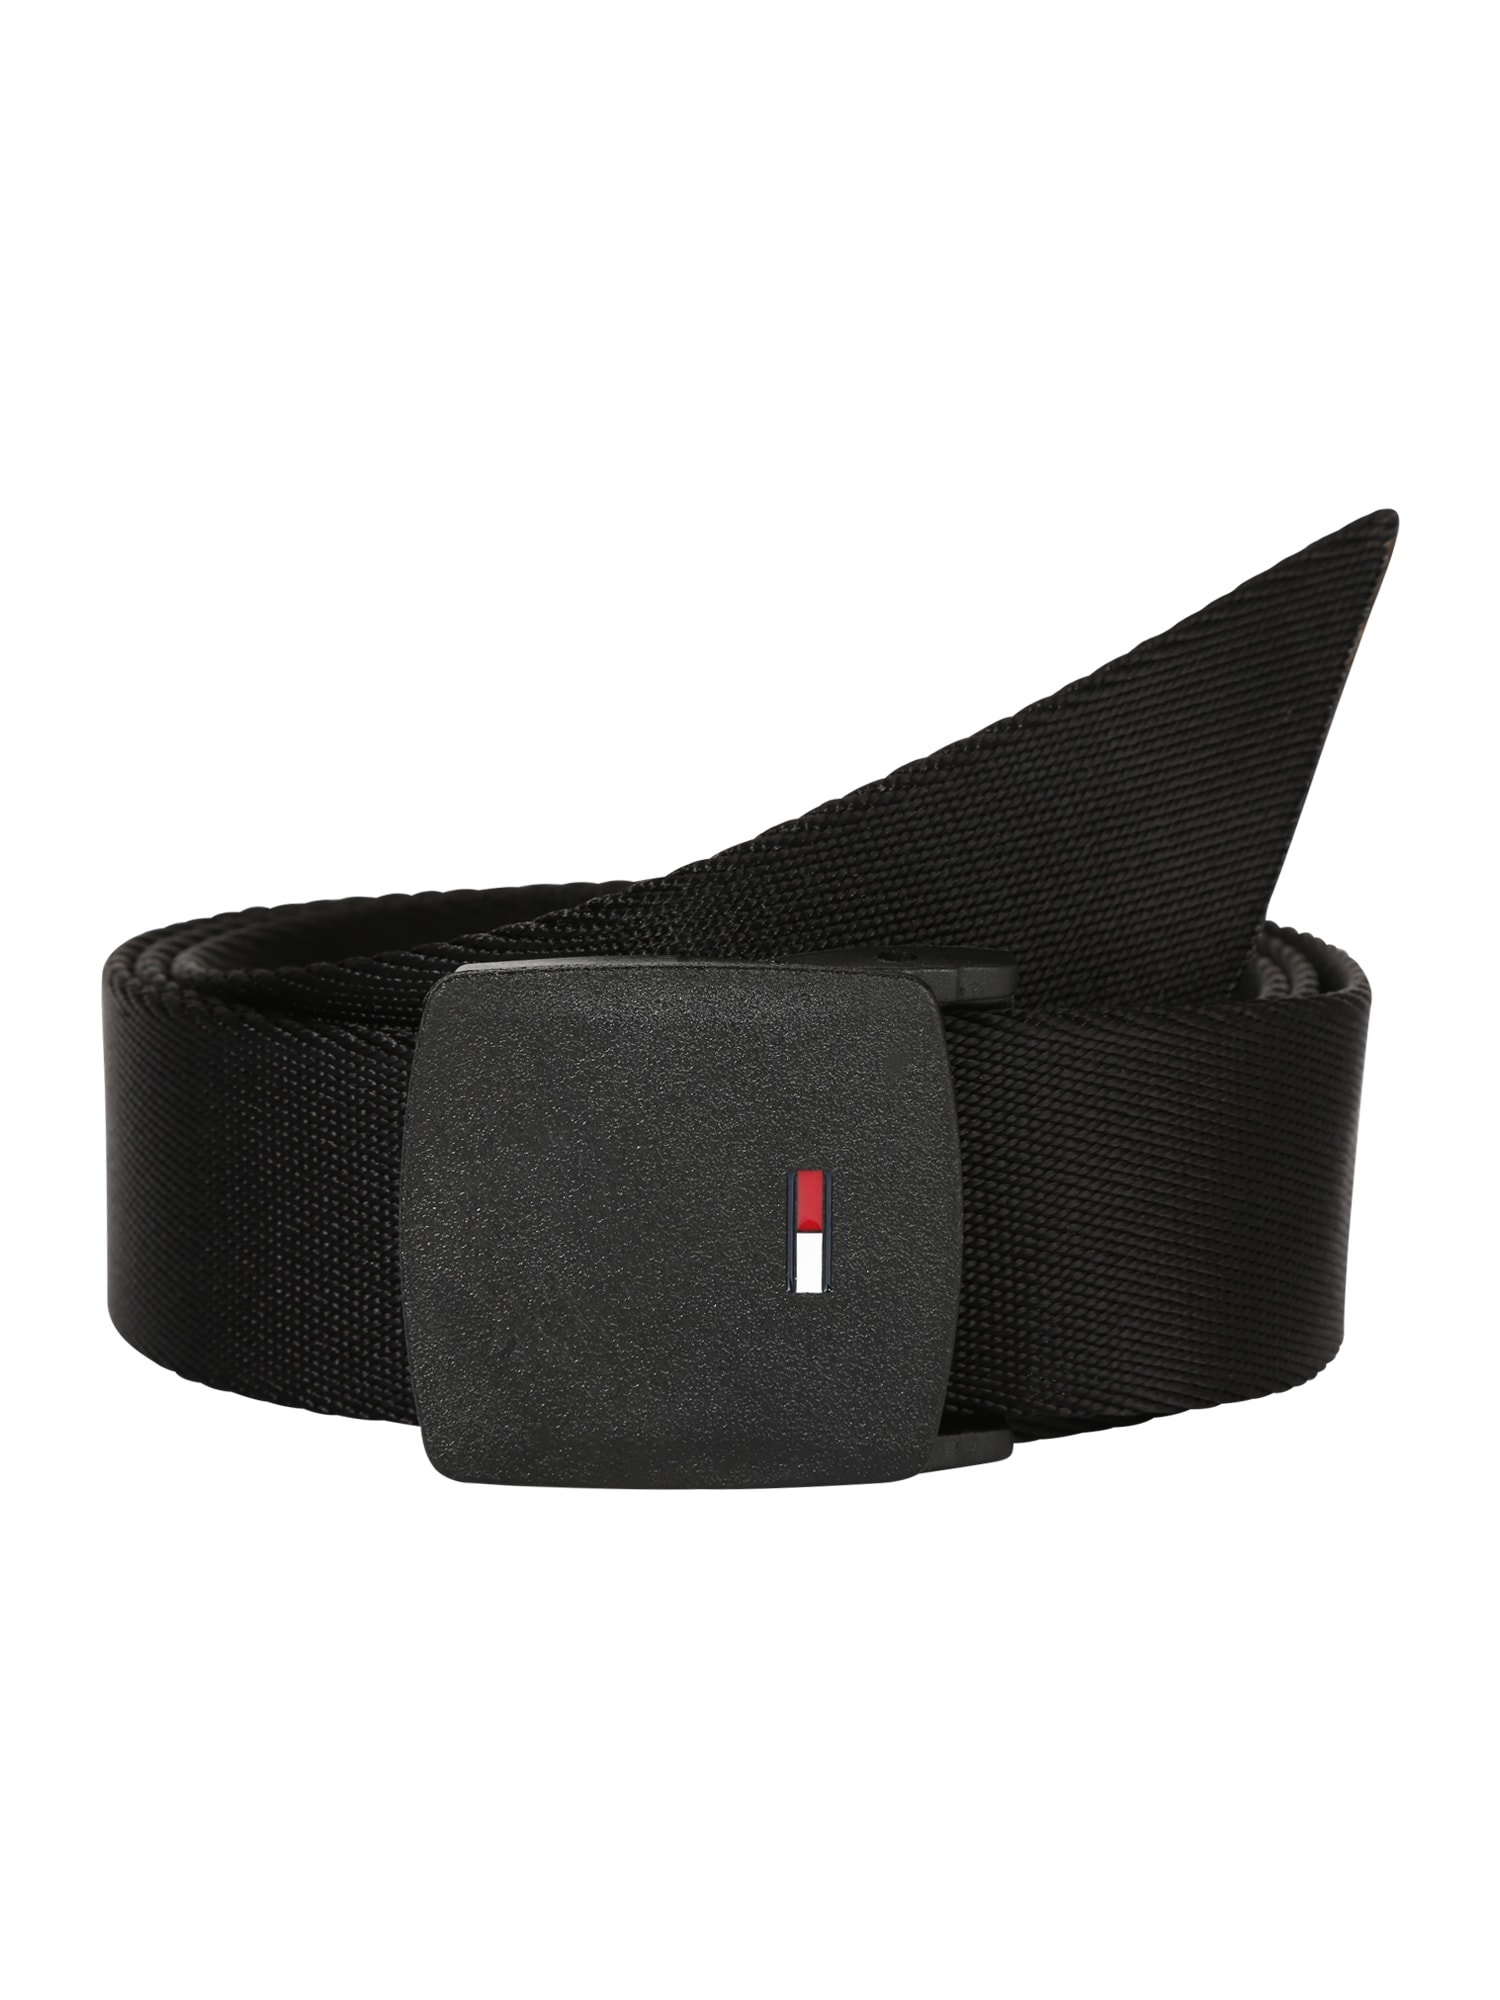 Opasek TJM PLAQUE WEBBING BELT 3.5 černá Tommy Jeans